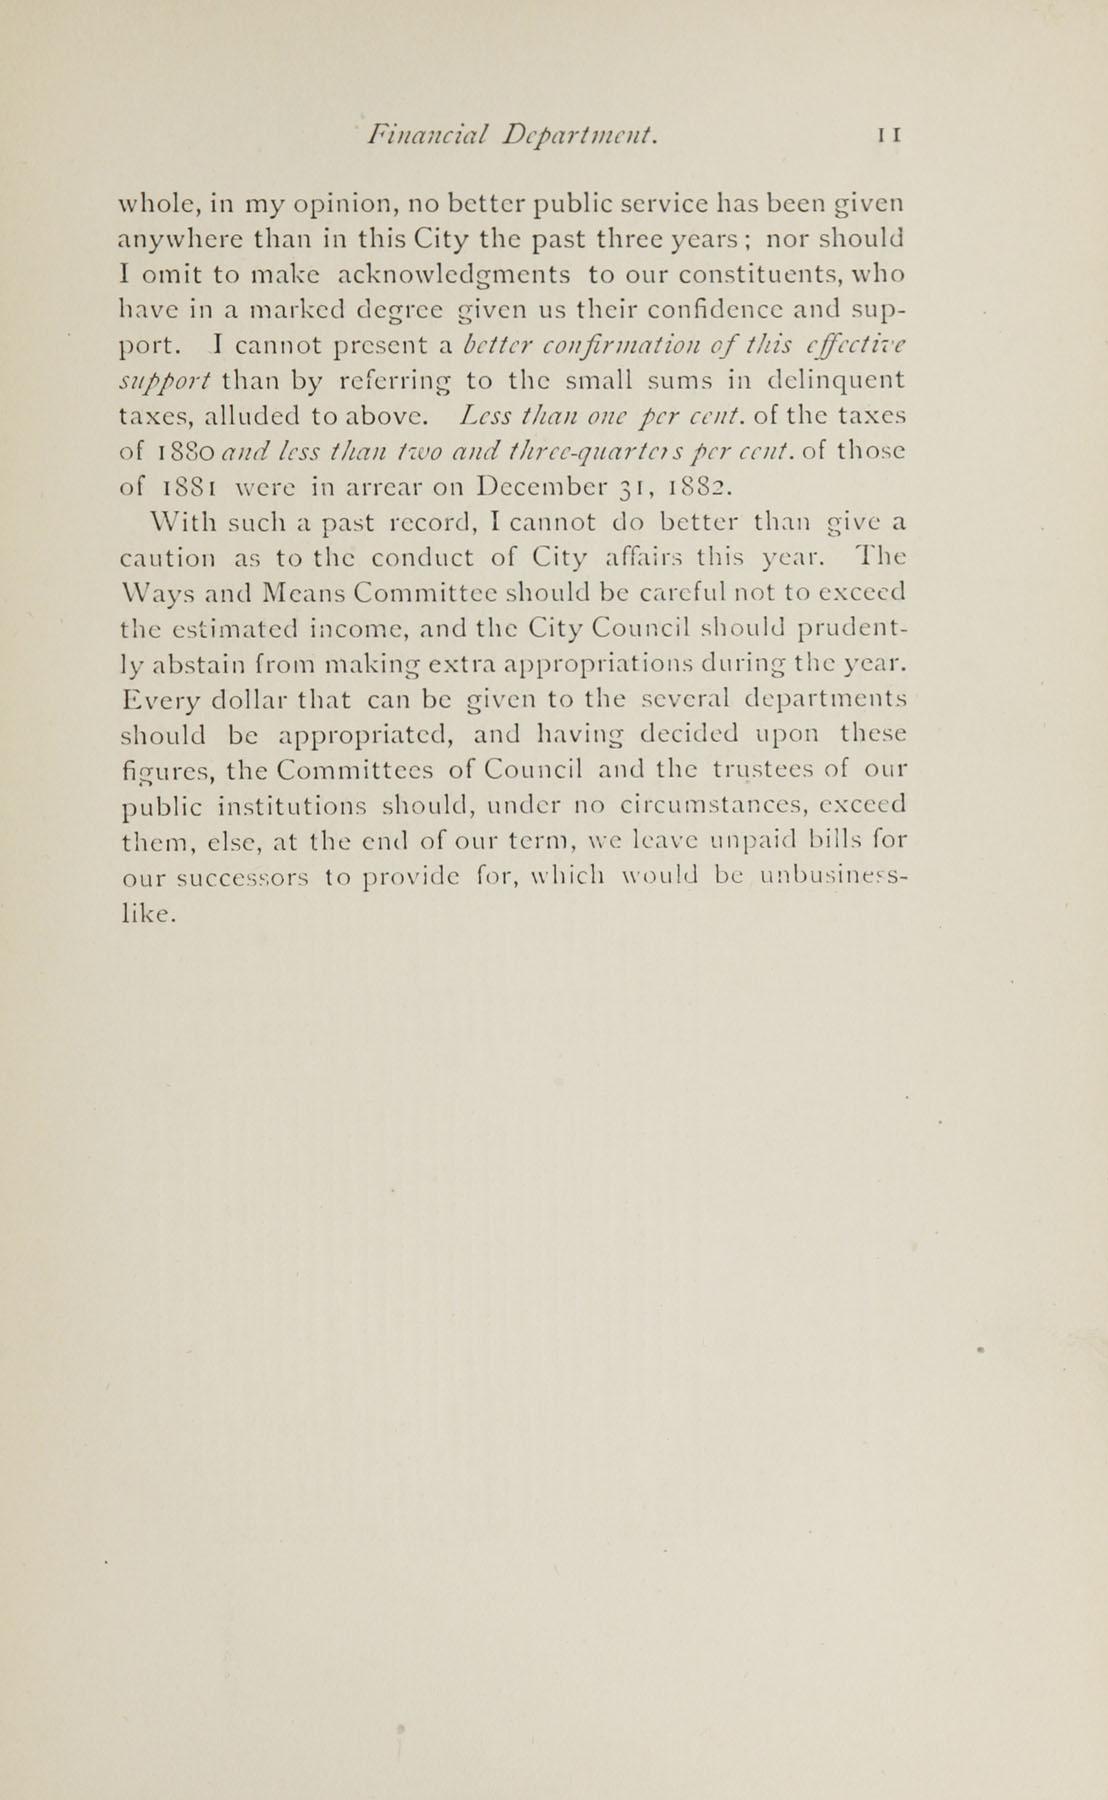 Charleston Yearbook, 1882, page 11